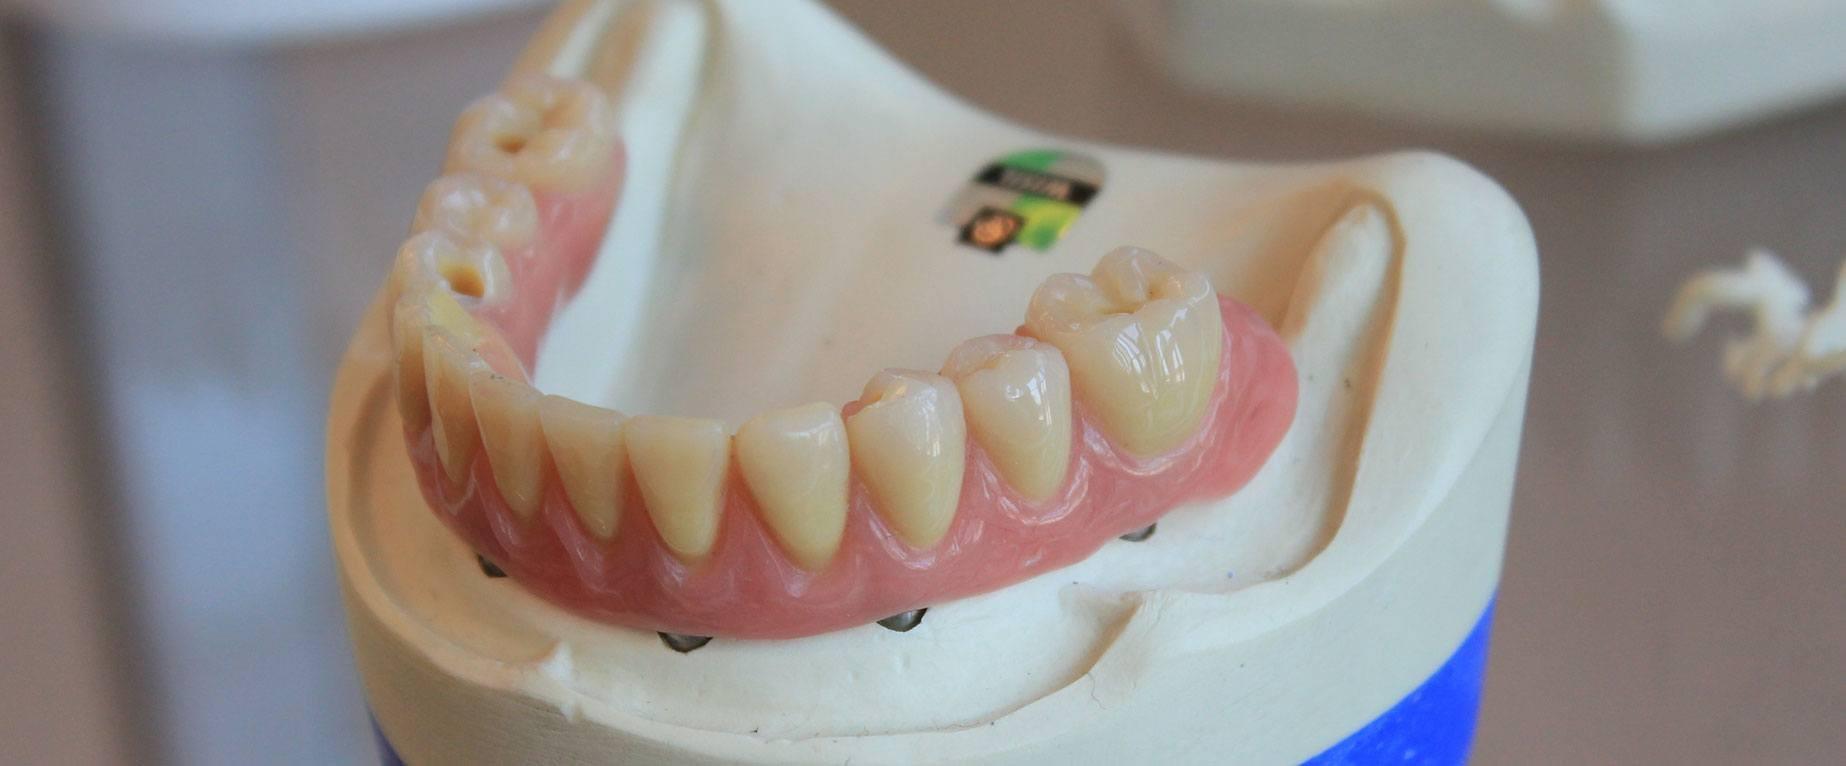 newest-dental-crowns